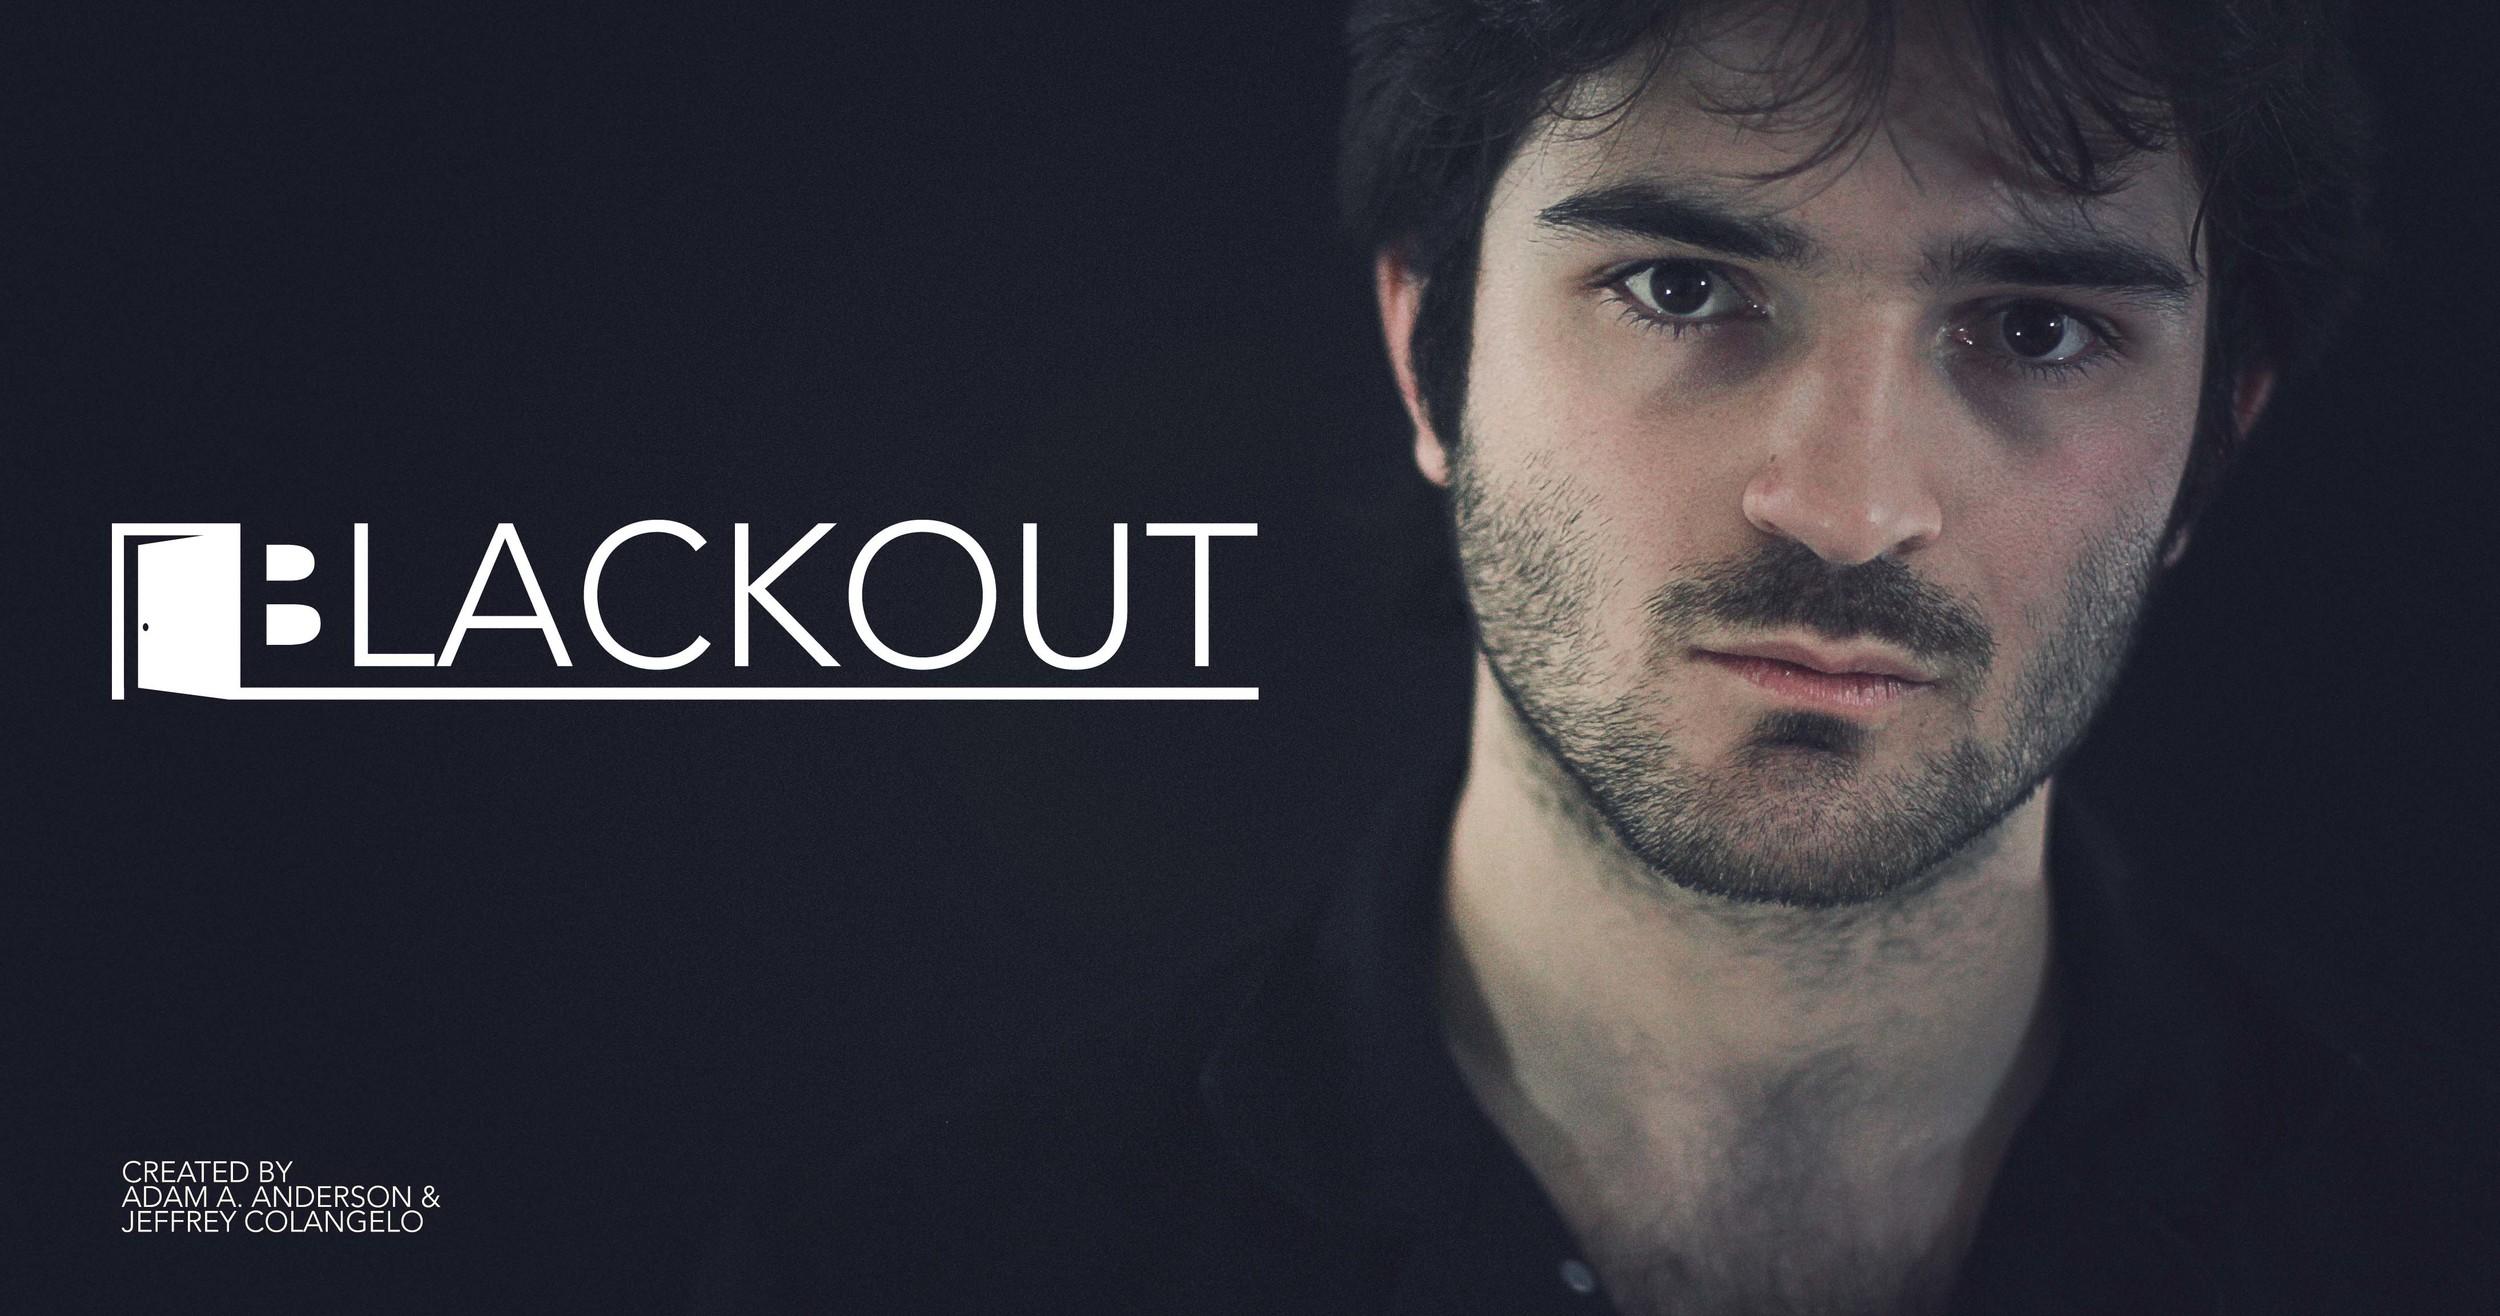 BlackoutPromo.jpg